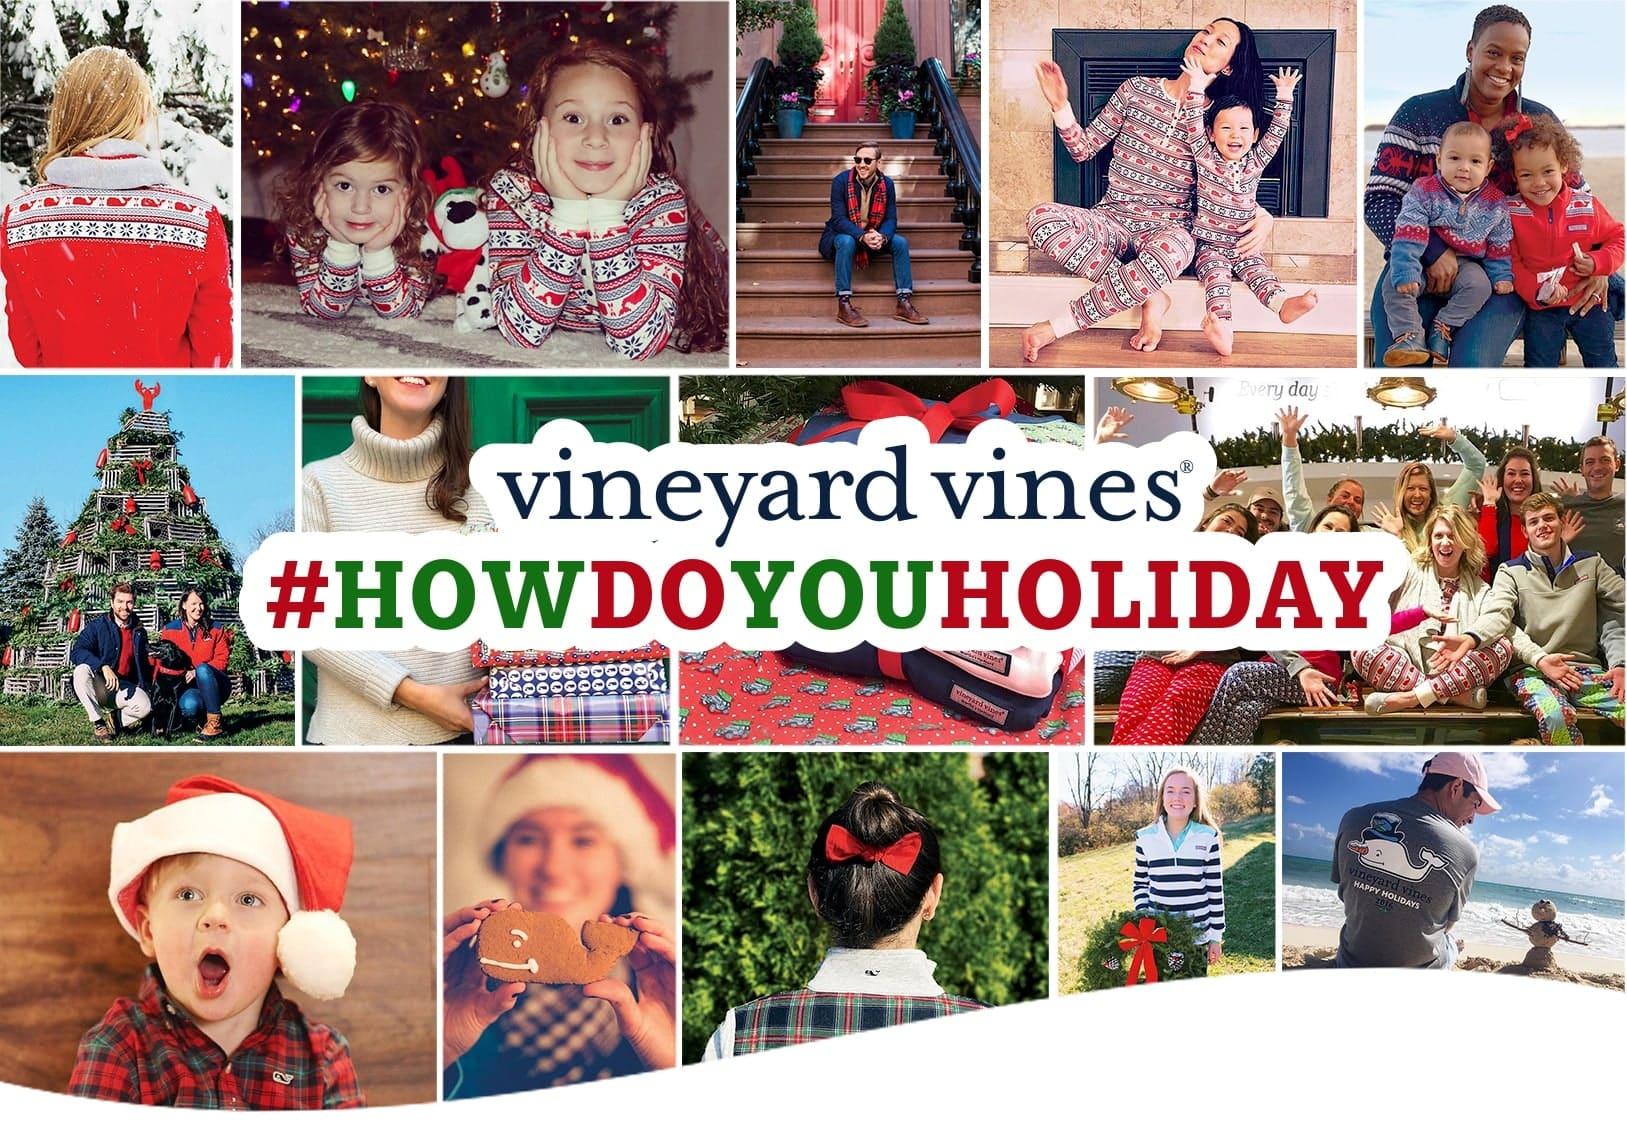 vineyard vines #howdoyouholiday